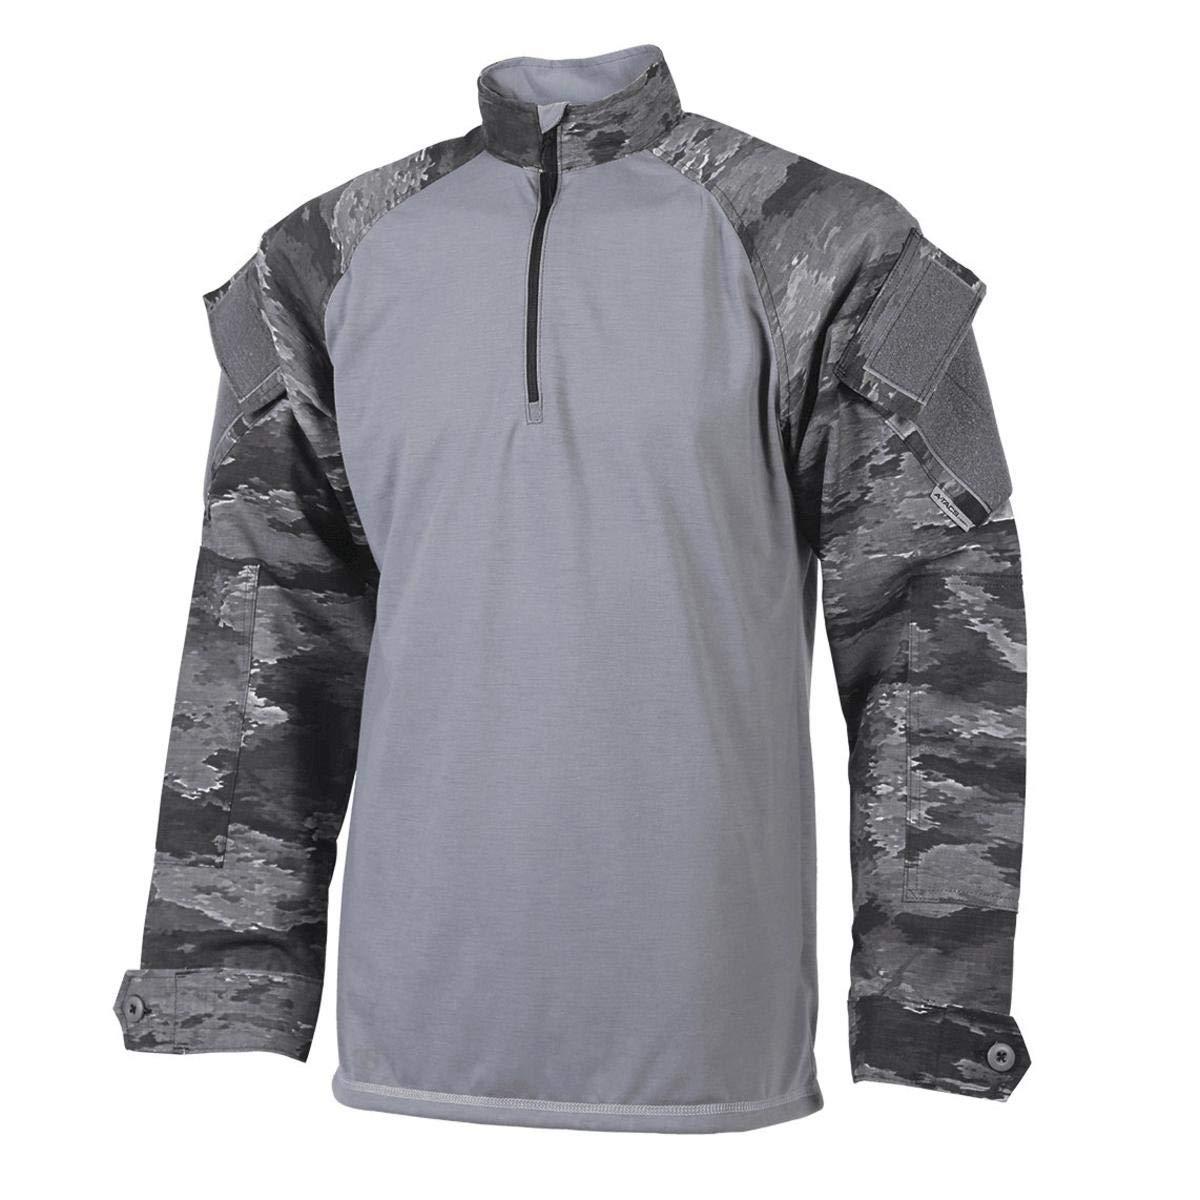 Tru-Spec Ghost コンバットシャツ A-TACS Ghost Lサイズ Xtreme BDU 1/4 Tru-Spec ジップ XL A-TACS ゴースト XL Lサイズ B07PYMJK1Z, ミナミマキムラ:f4296c73 --- gamenavi.club